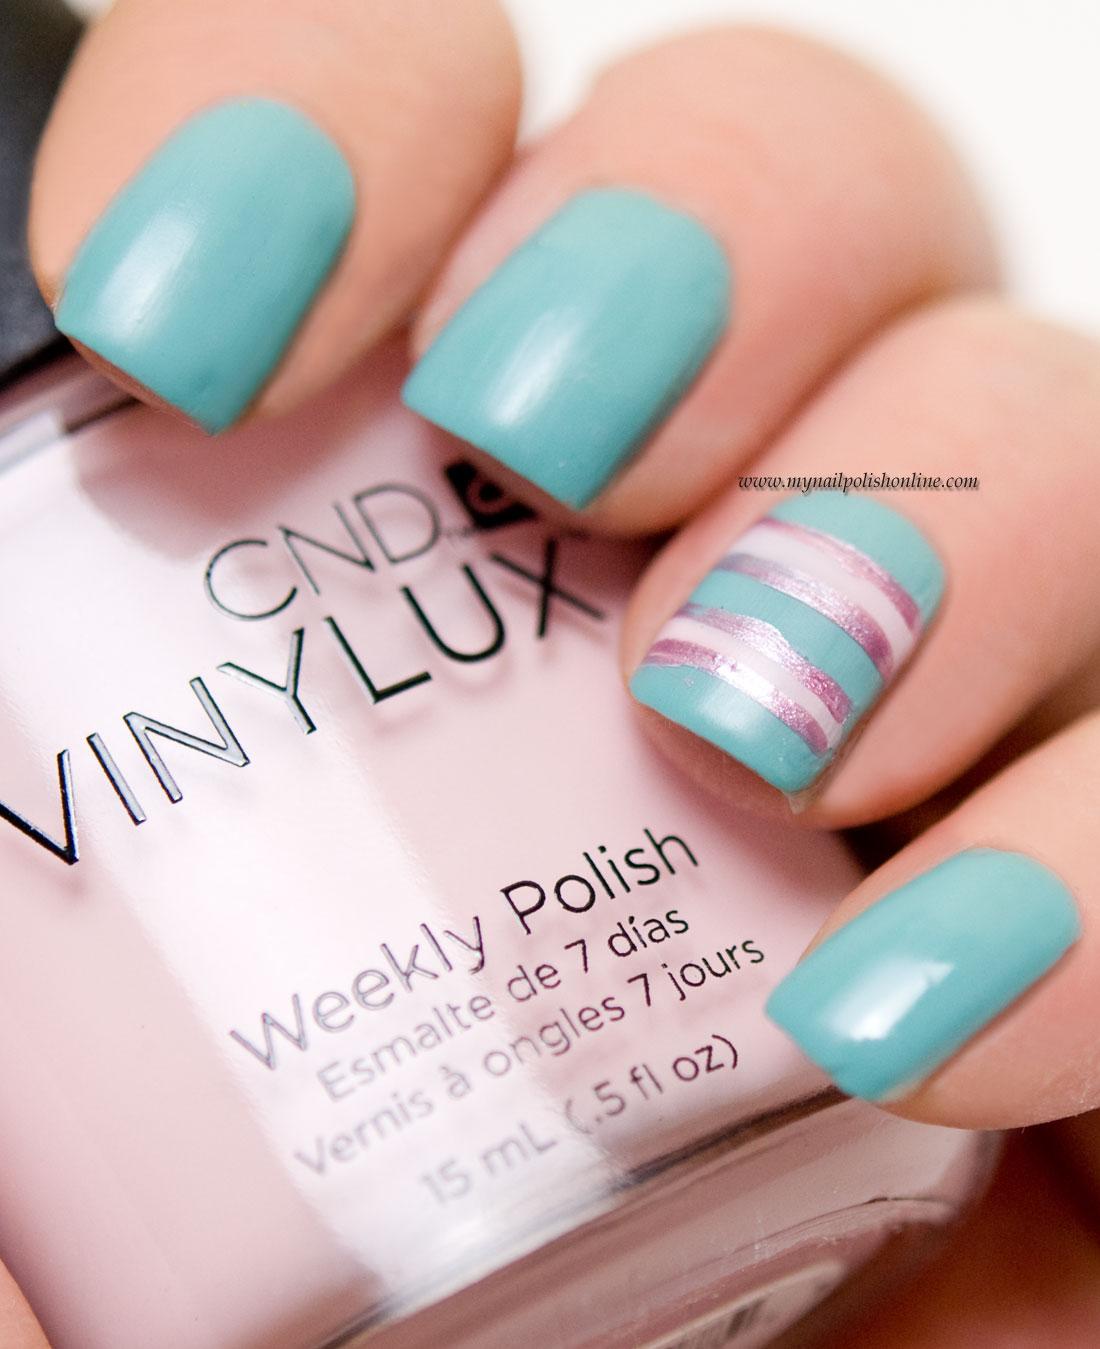 Concrete And Nail Polish Striped Nail Art: Pastel Nail Art With Stripes